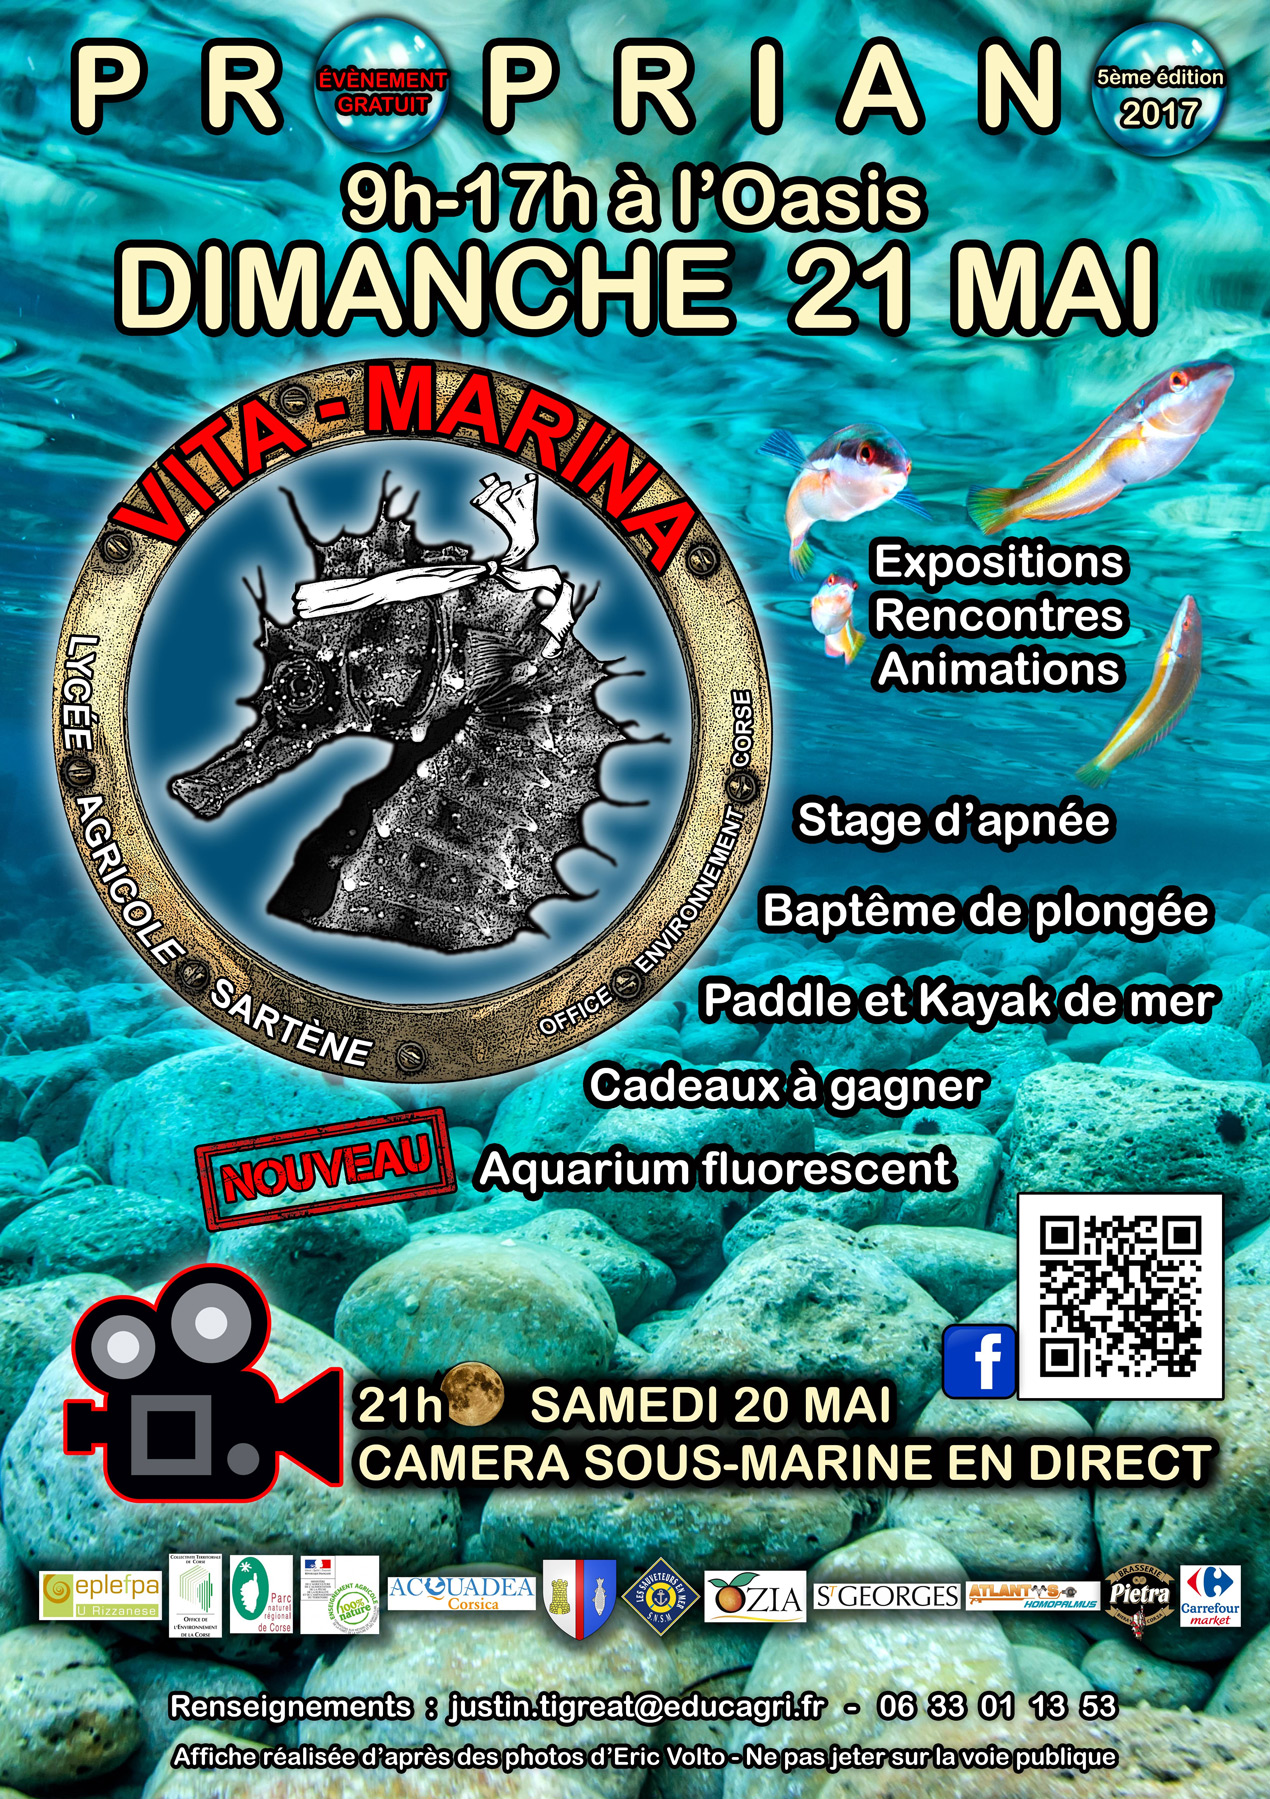 Vita Marina 2017, à Propriano les 20 et 21 mai : Exposition mer Méditerranée